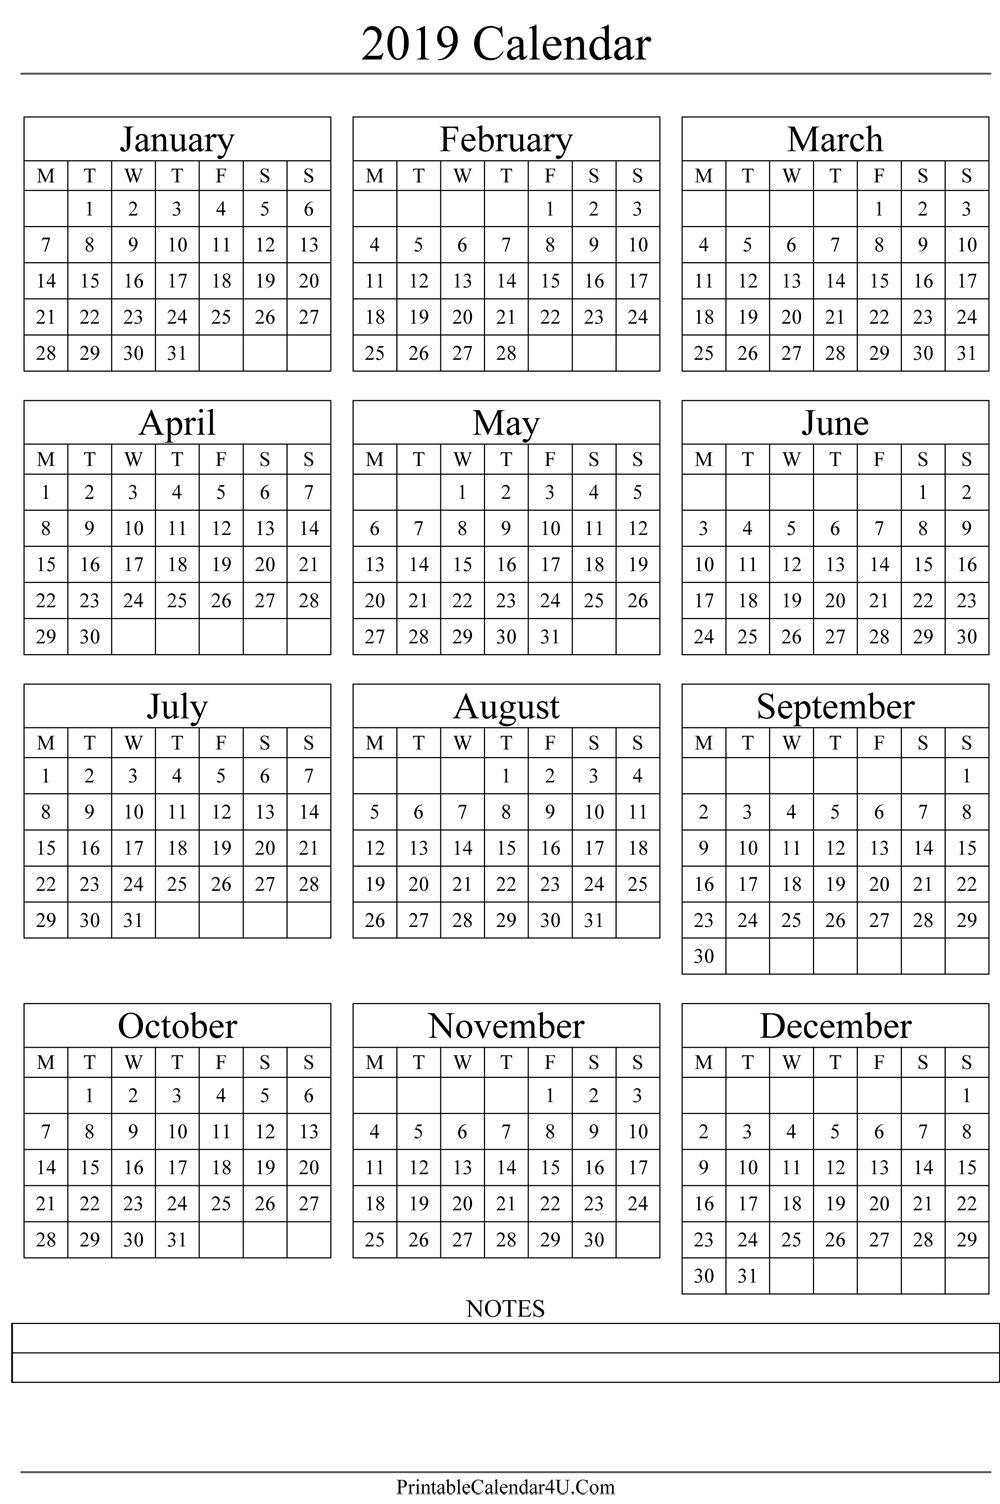 Annual Calendar 2019 Portrait Printable Calendar 2017 | Gift Ideas with Portriat Style Free Printable Calendar 2019-2020